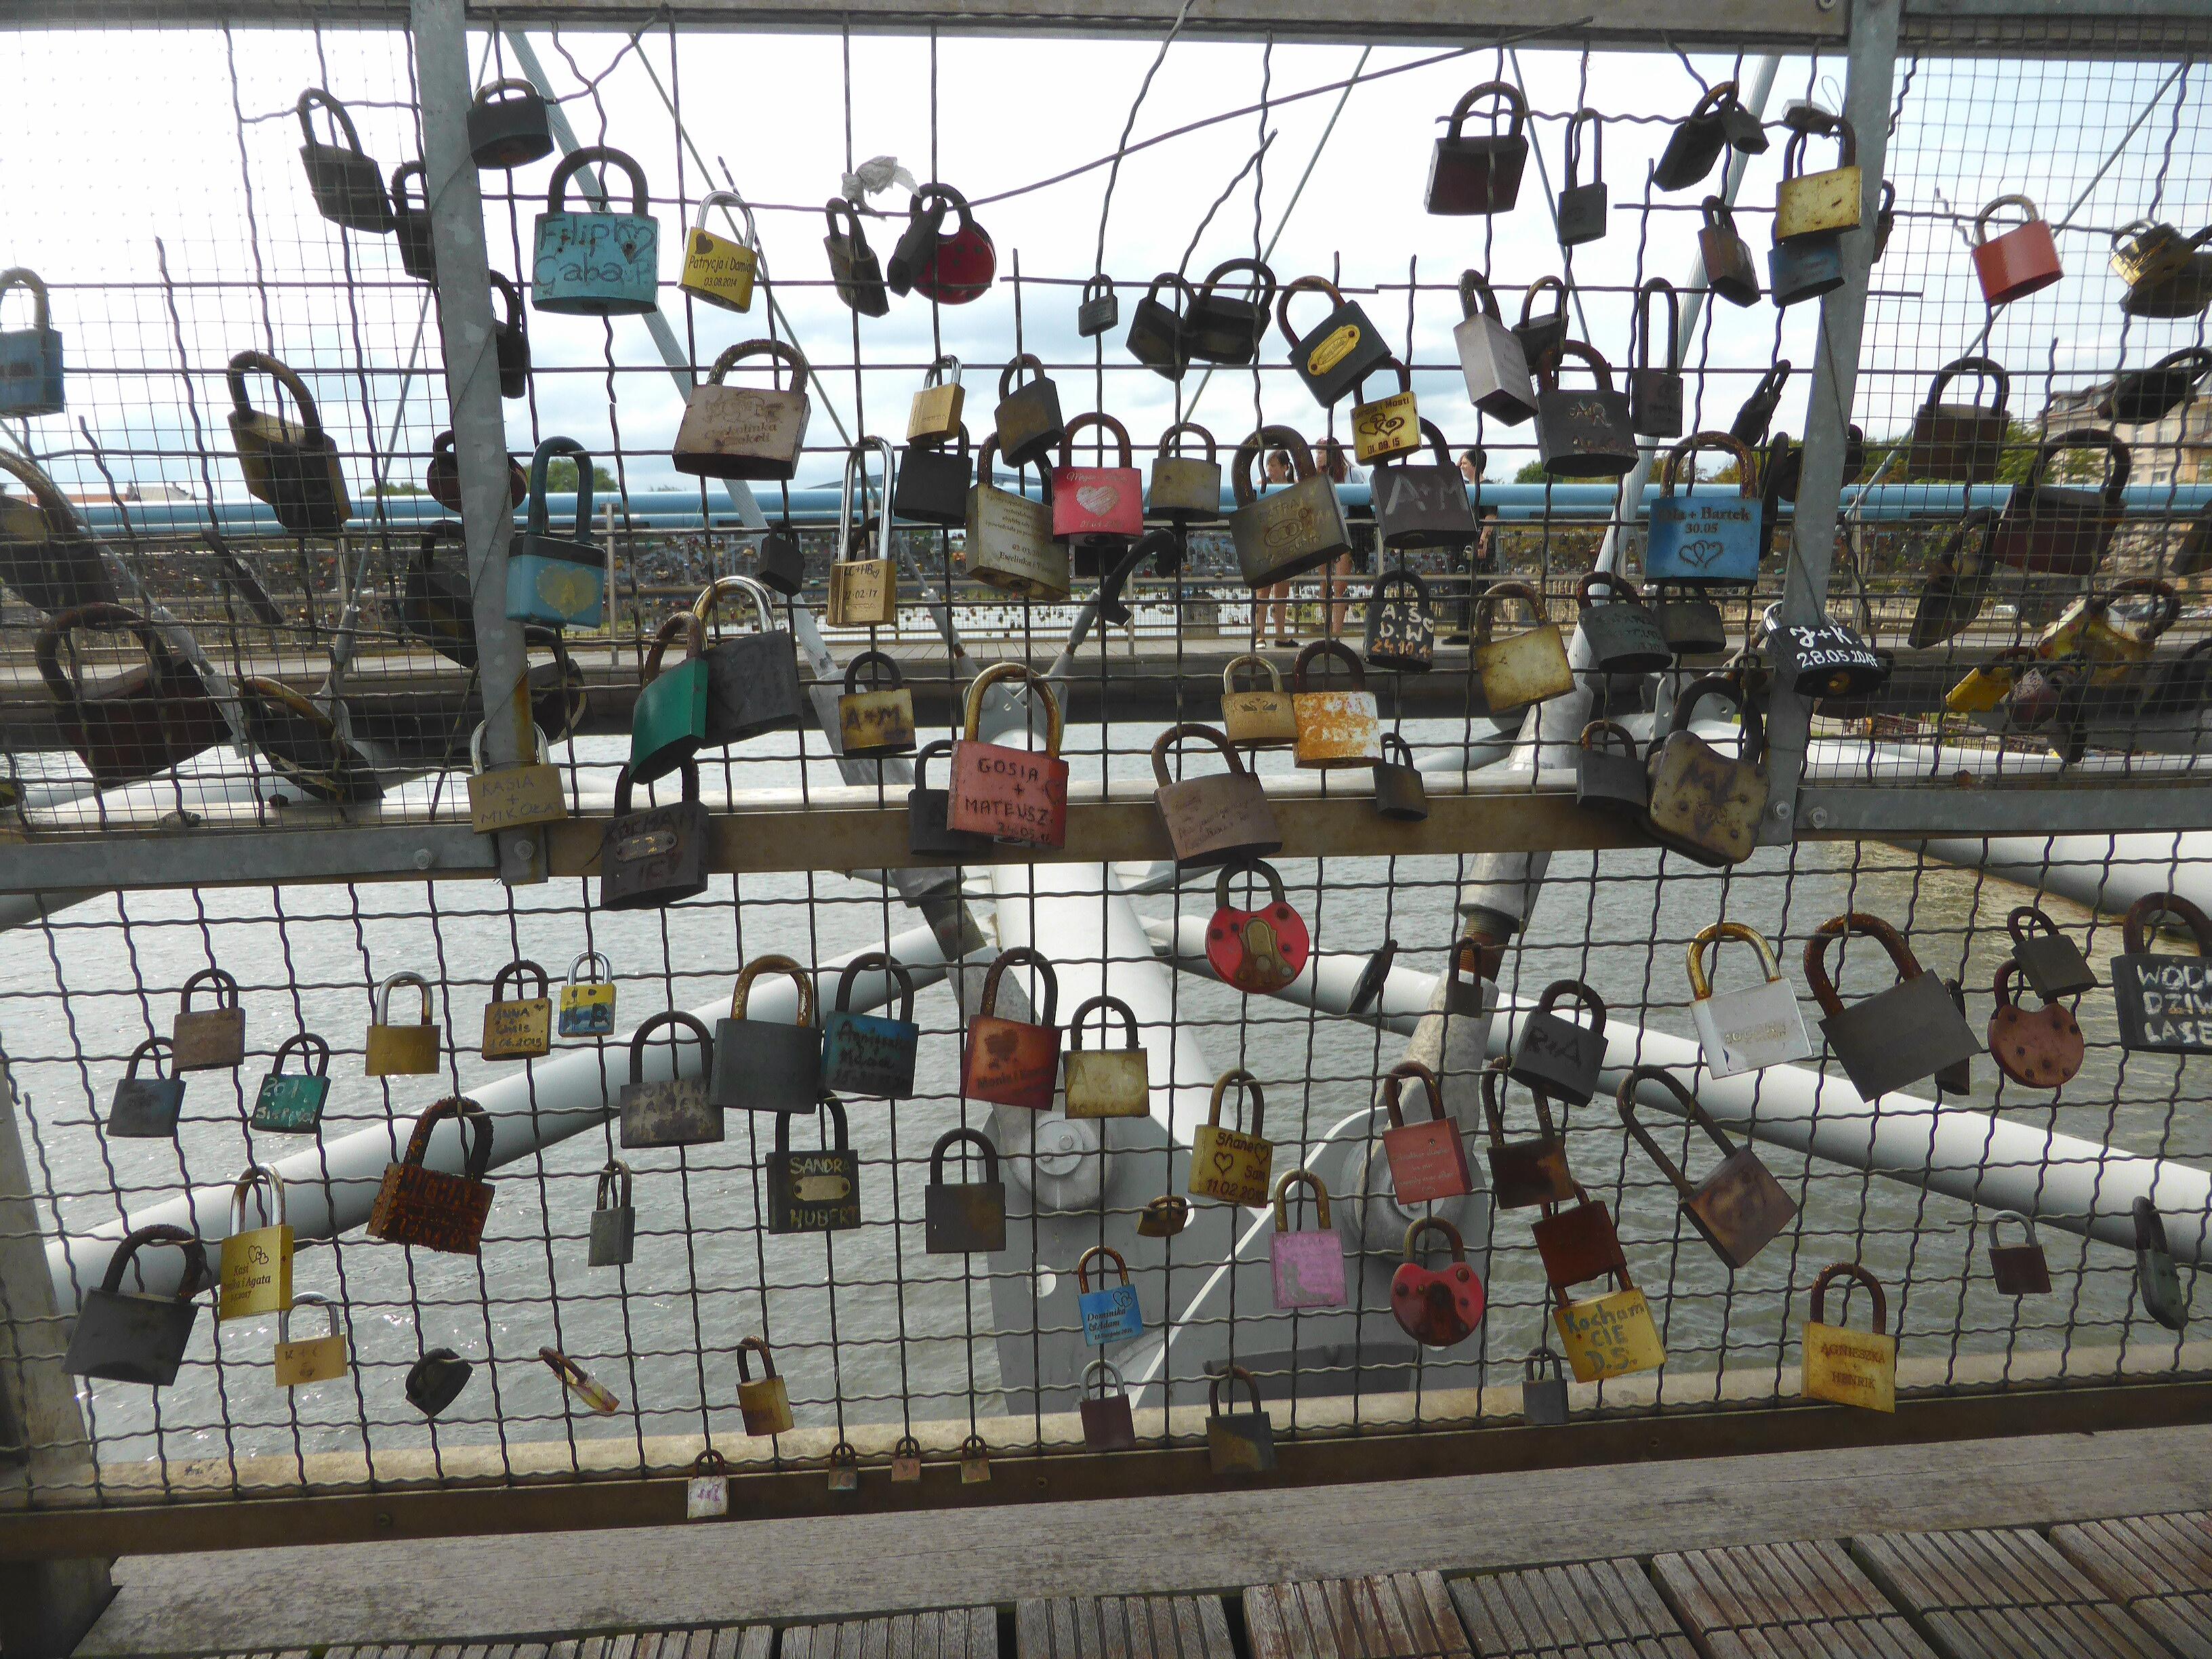 Hardlopen in Krakau, hangsloten om de liefde te bezegelen